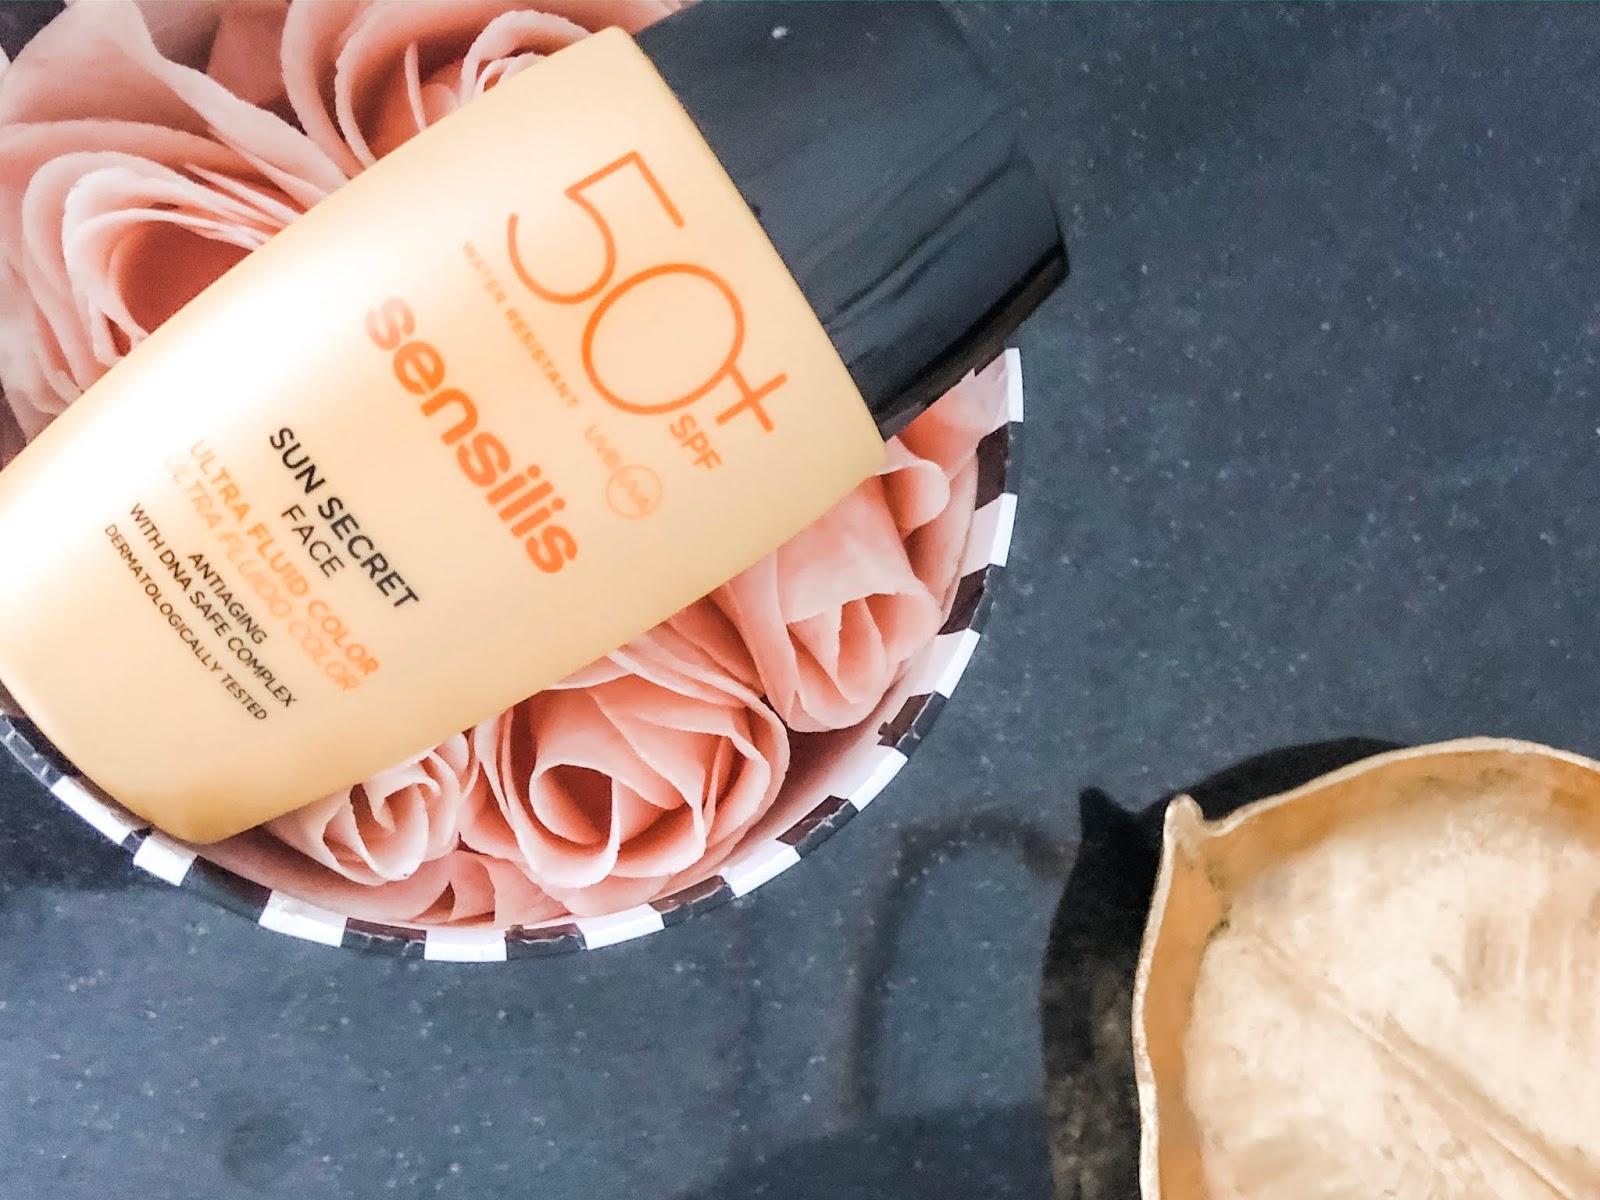 sunscreen 50+ sensilis